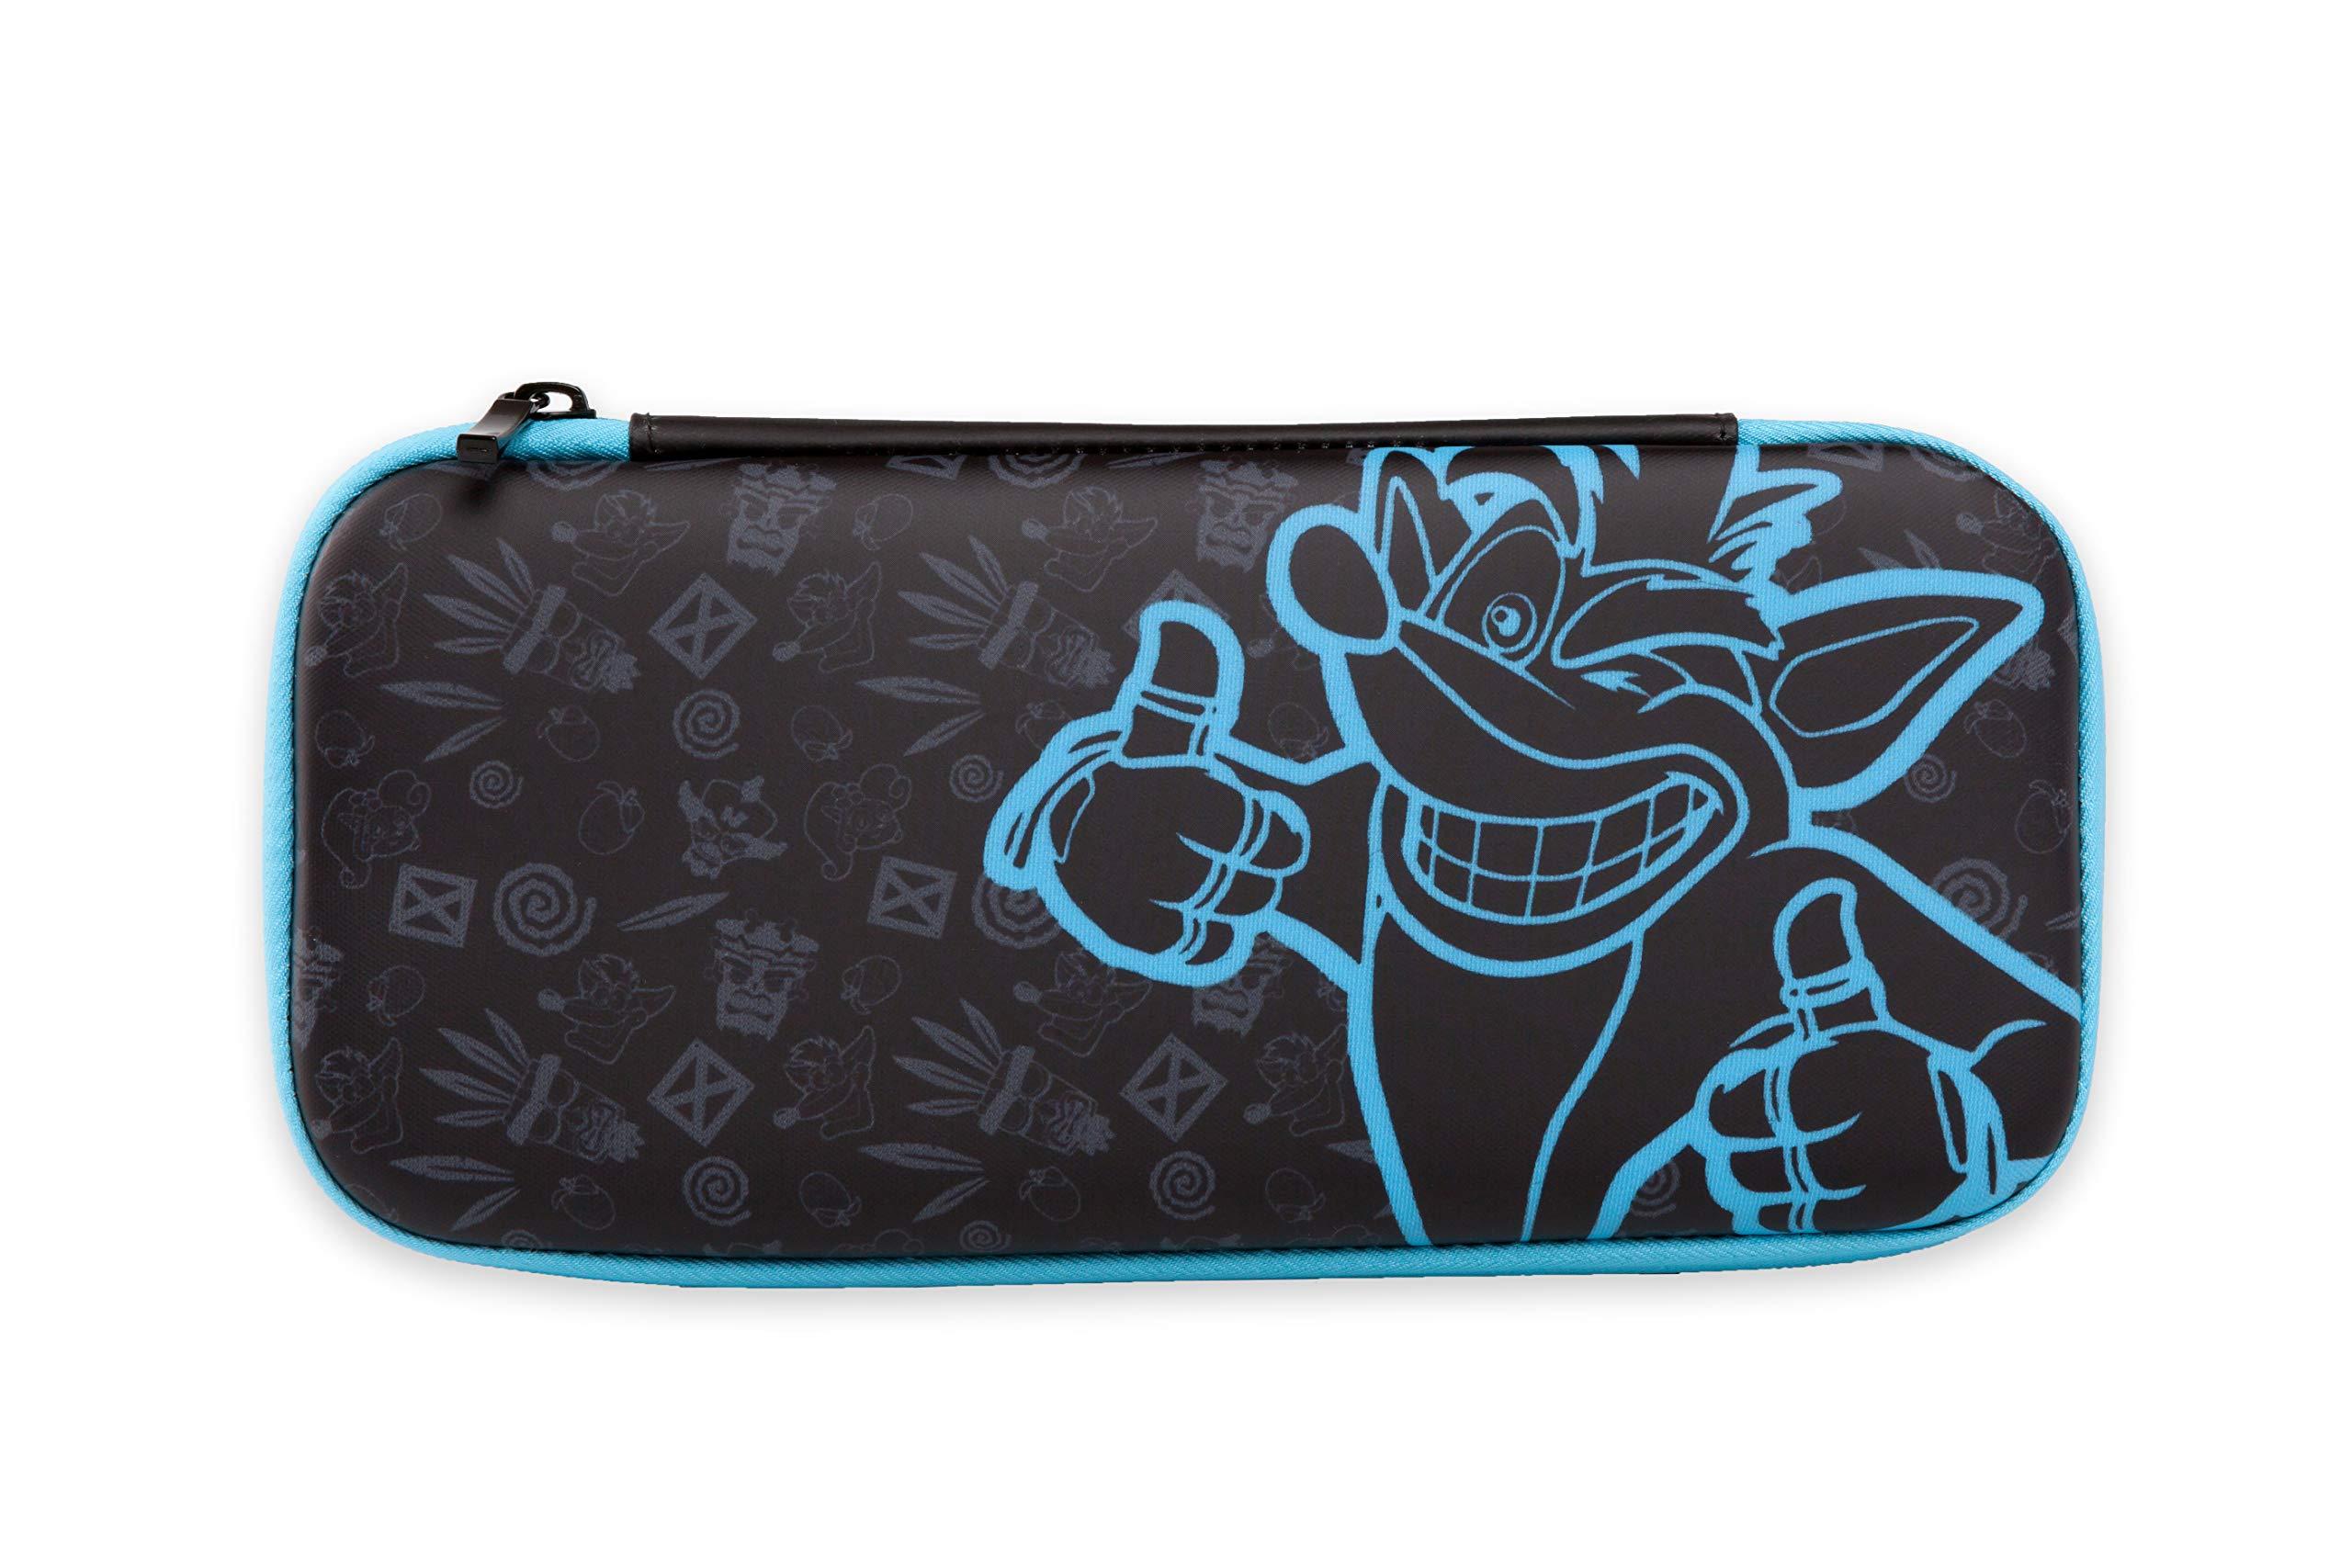 Kit De Viaje Sencillo Crash Bandicoot (Nintendo Switch): Amazon.es: Videojuegos